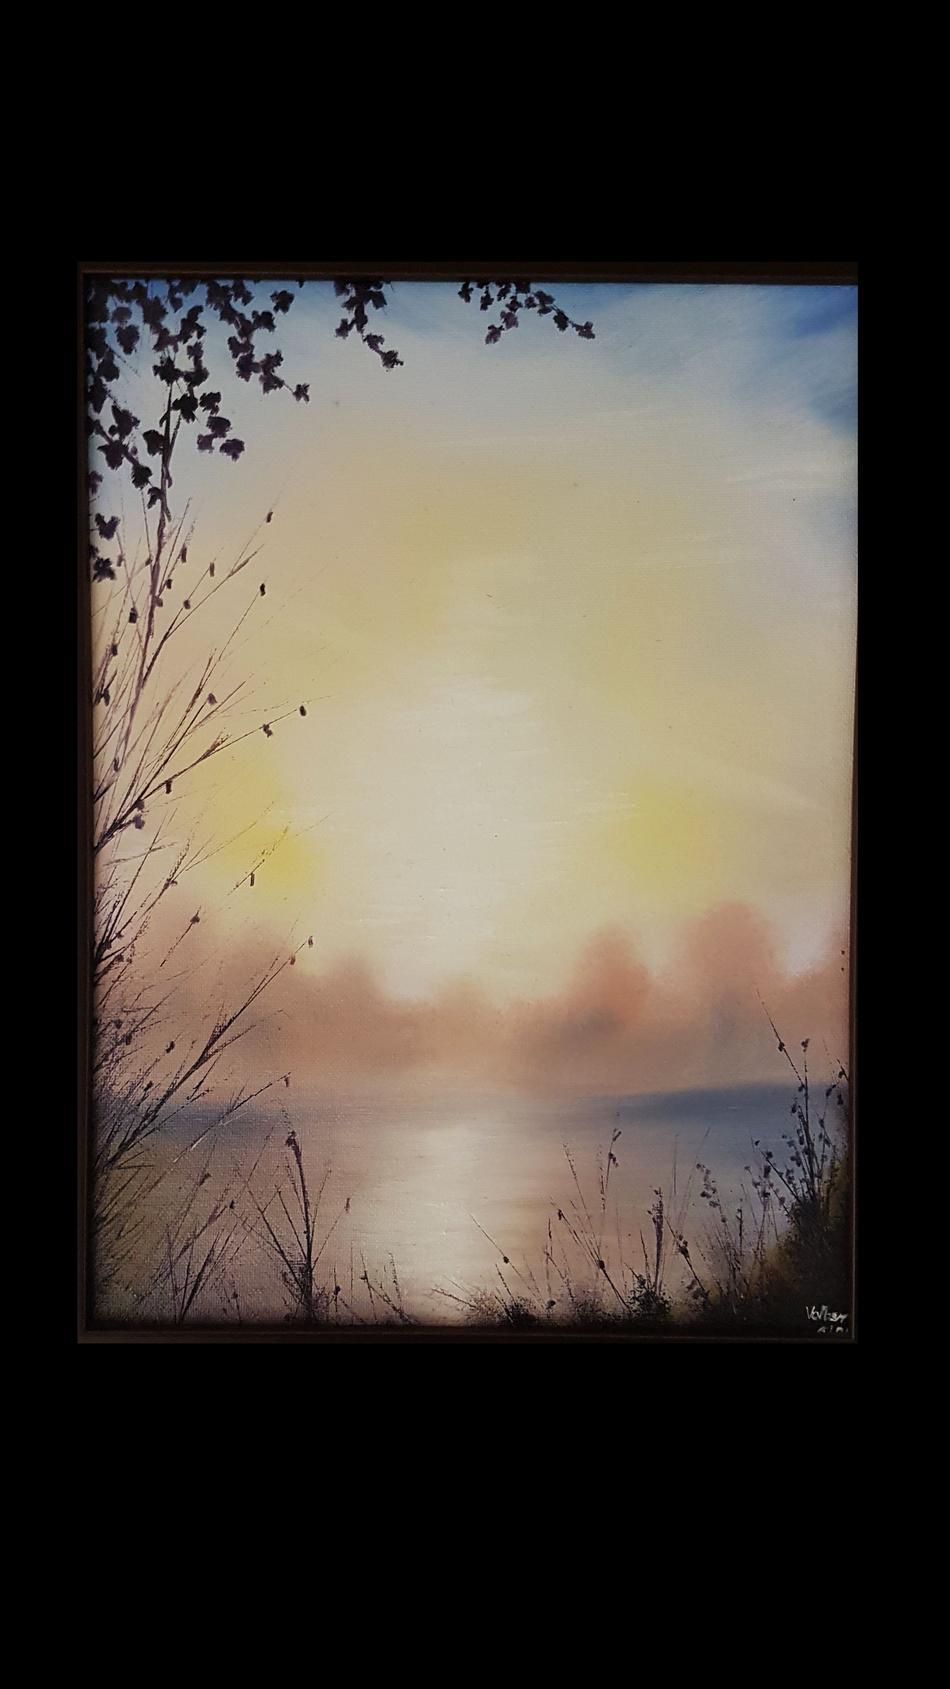 2014-01-12 14-58-04 - Gemälde013.jpg